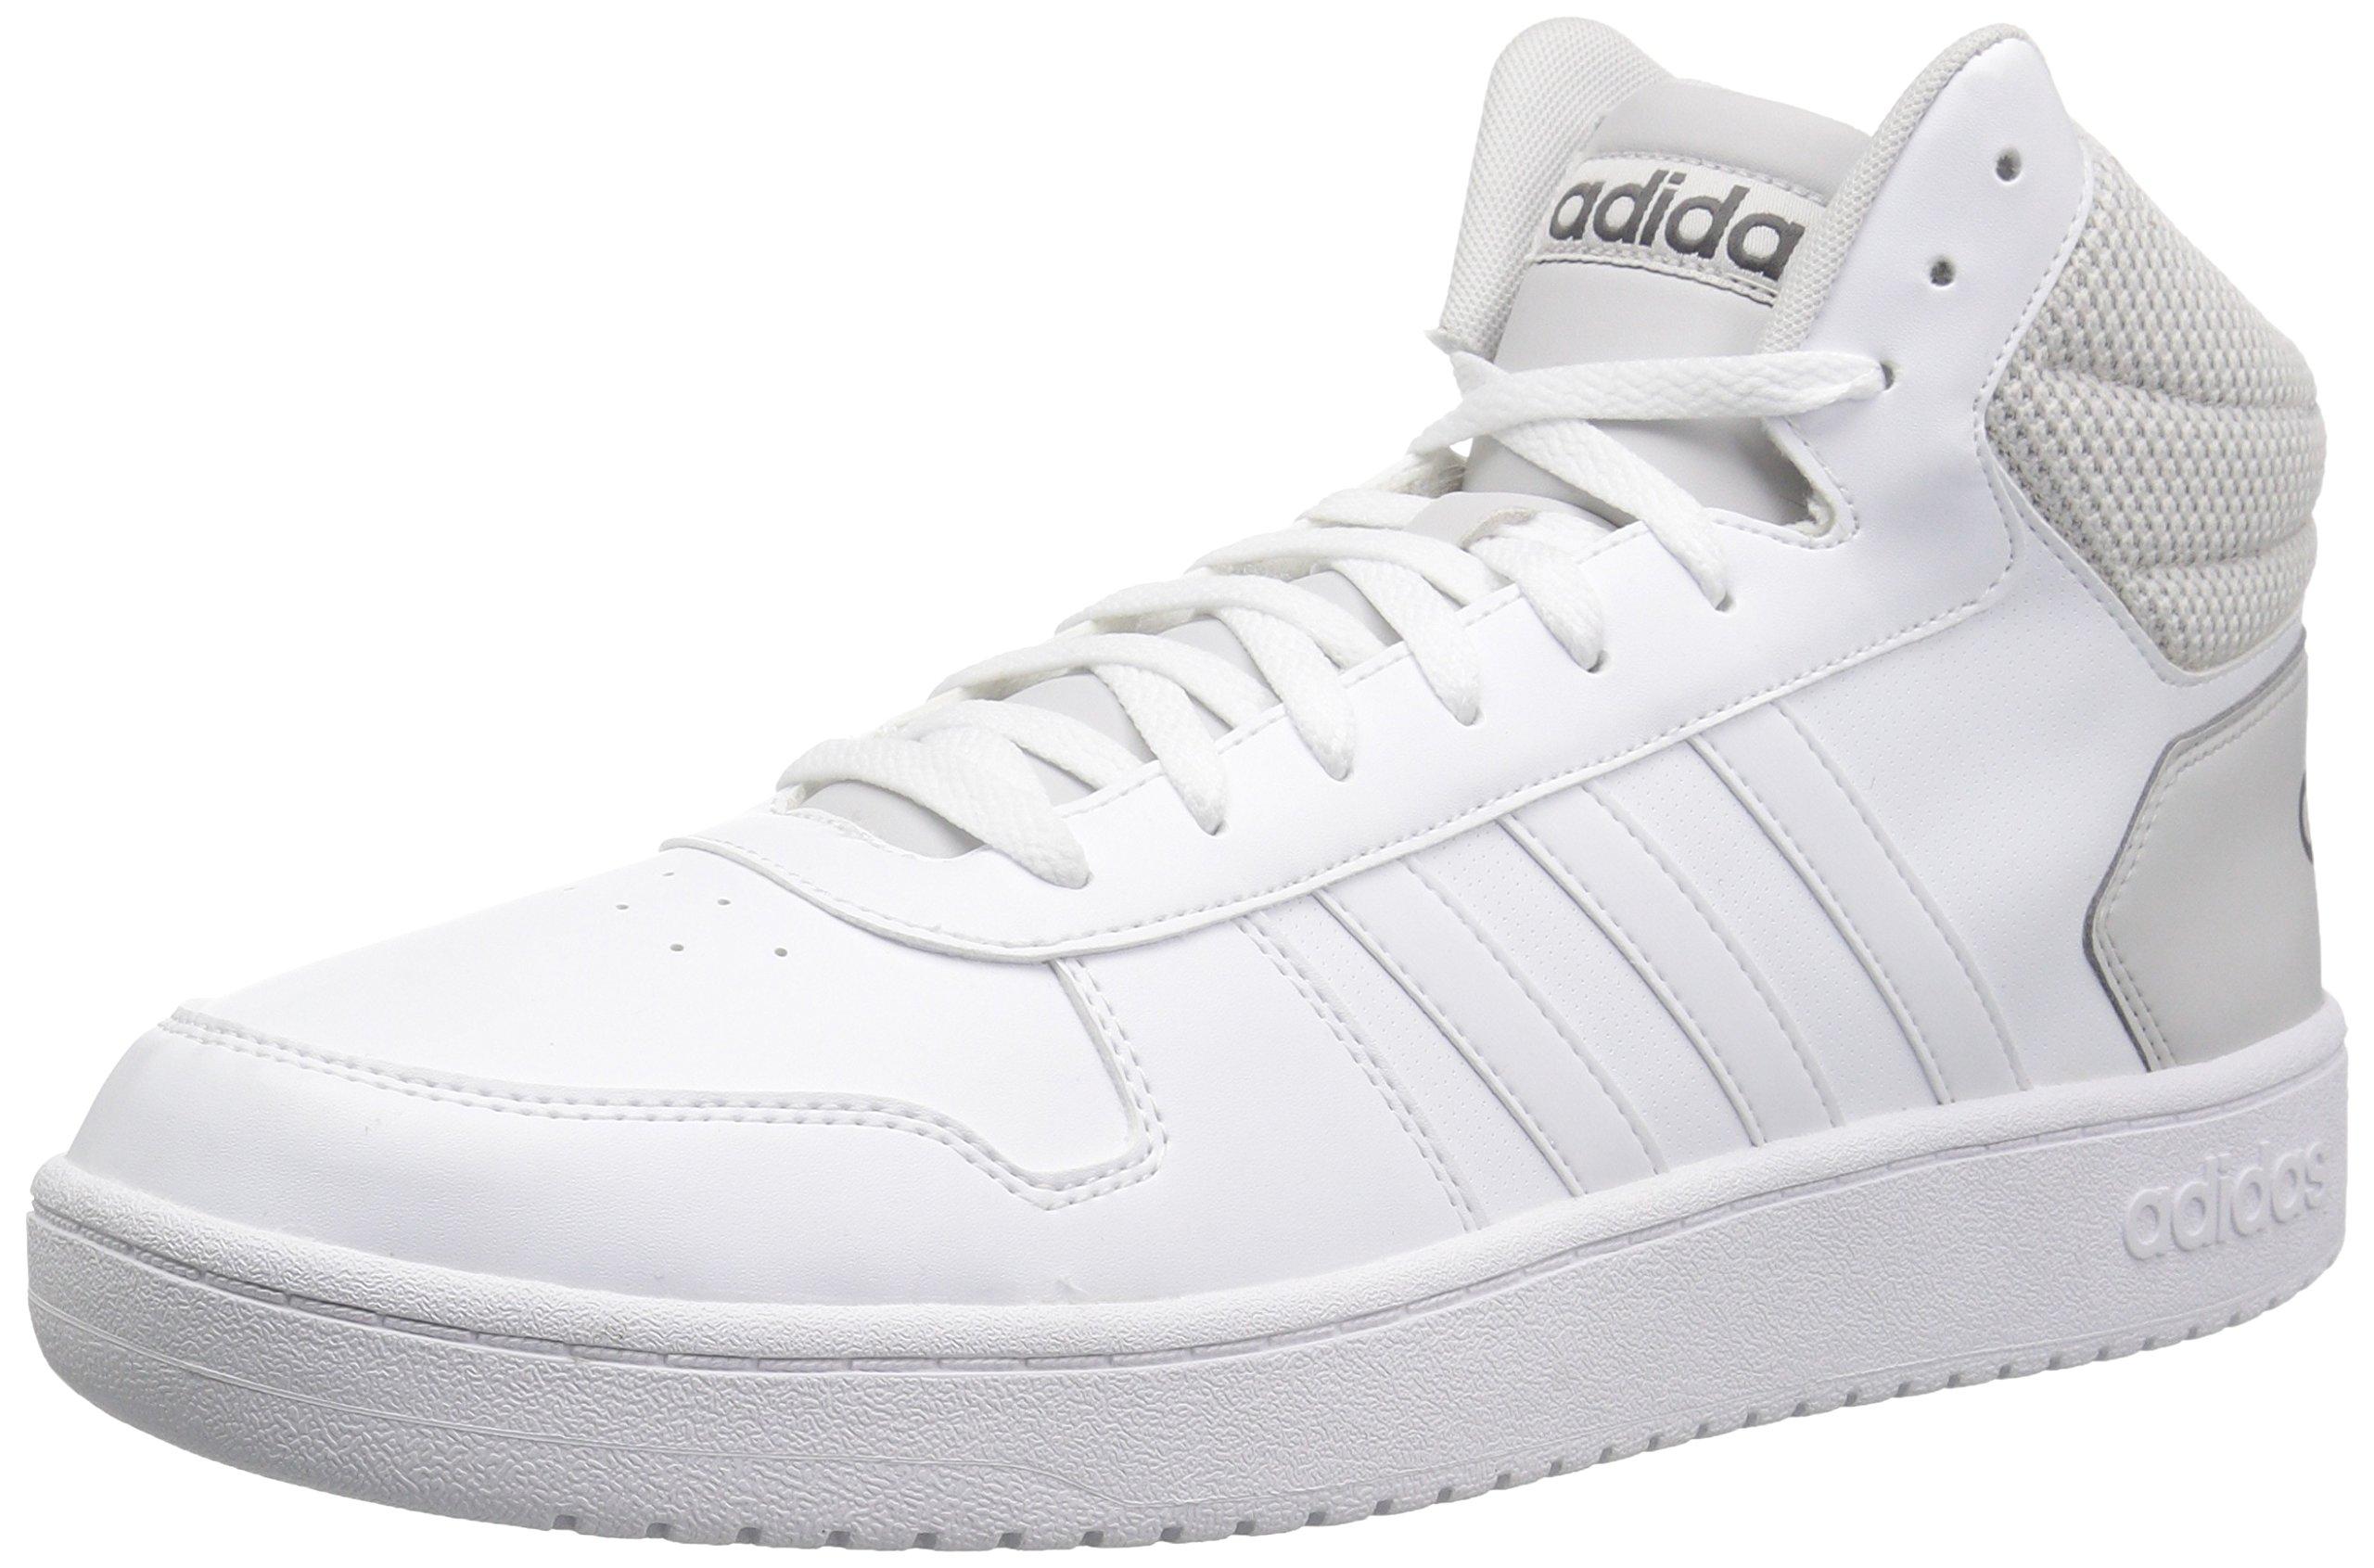 bab980a65230 Galleon - Adidas Men s VS Hoops Mid 2.0